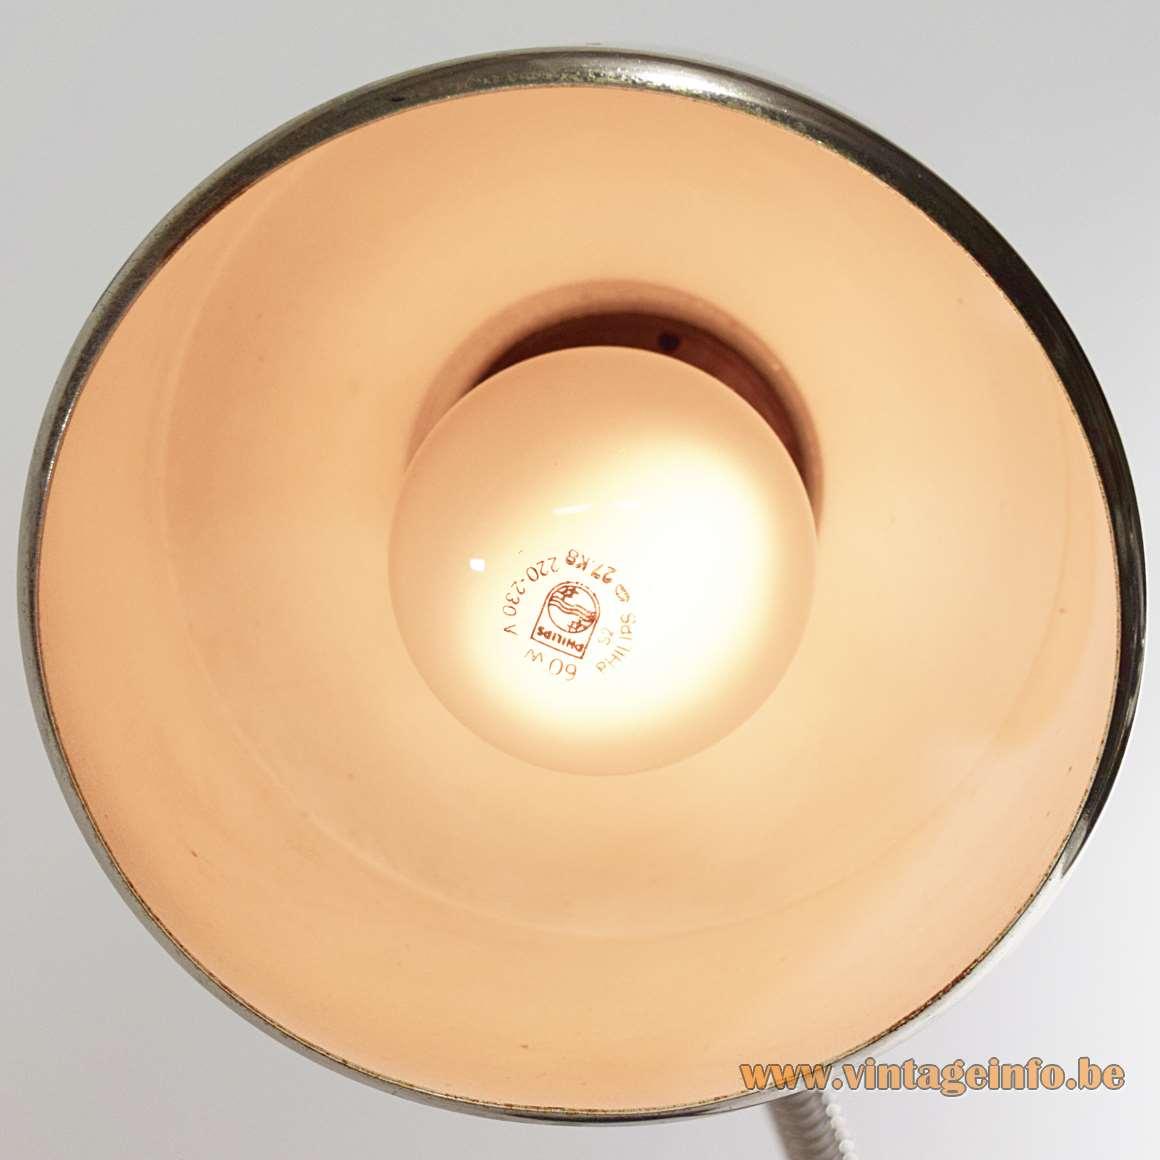 1960s Gooseneck Desk Lamp table light Hala Zeist Netherlands chrome metal 1970s MCM